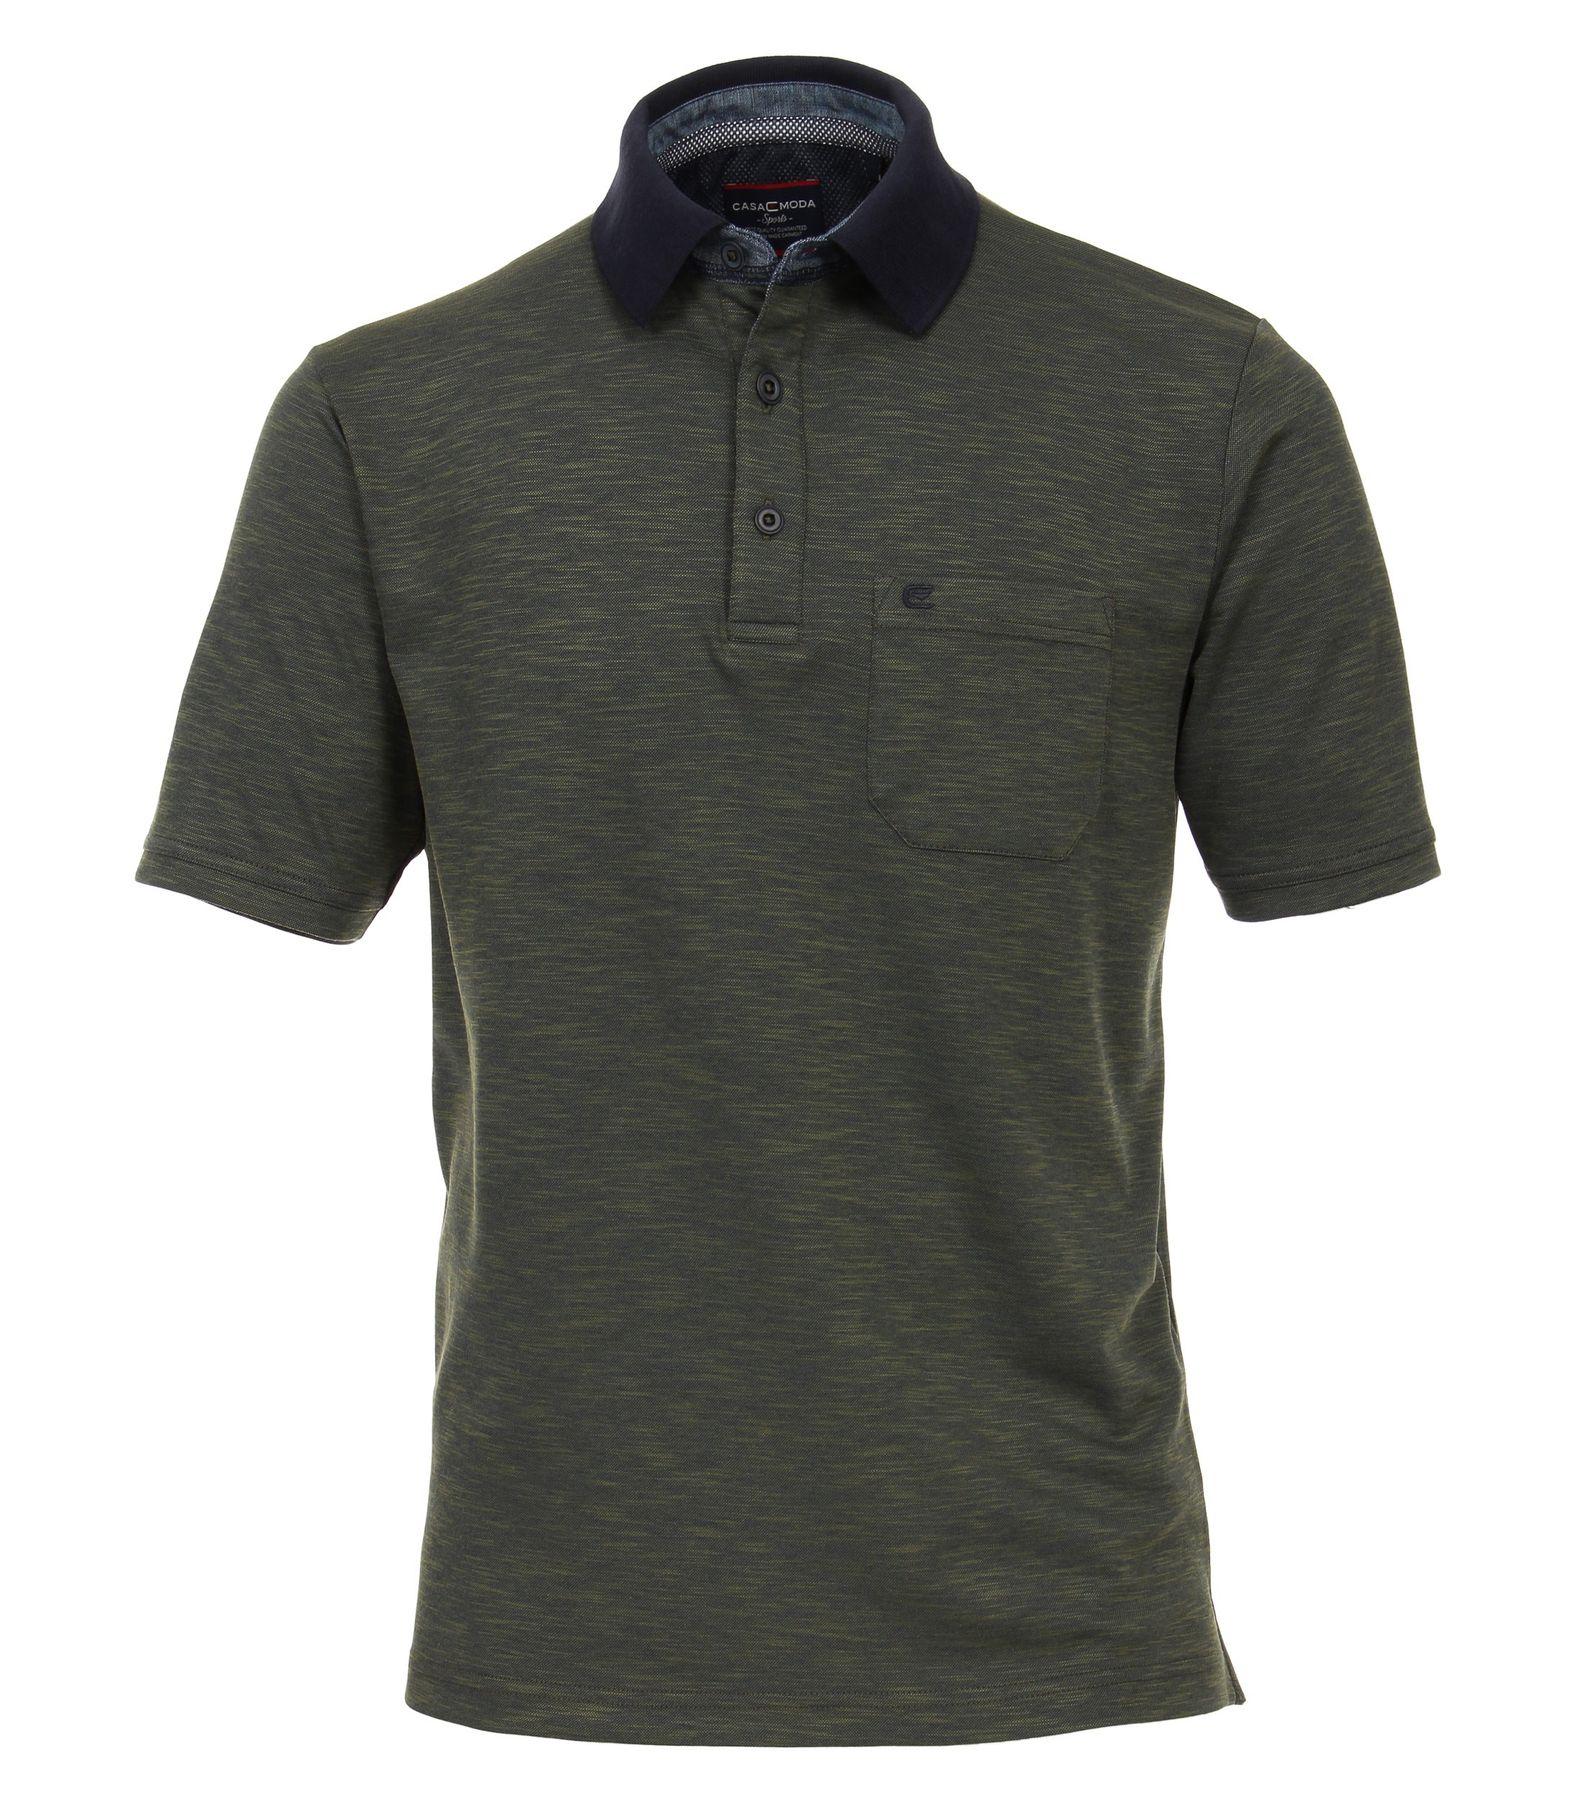 Casa Moda - Herren Polo Shirt 1/2 Arm in verschiedenen Farben (982894100) – Bild 3